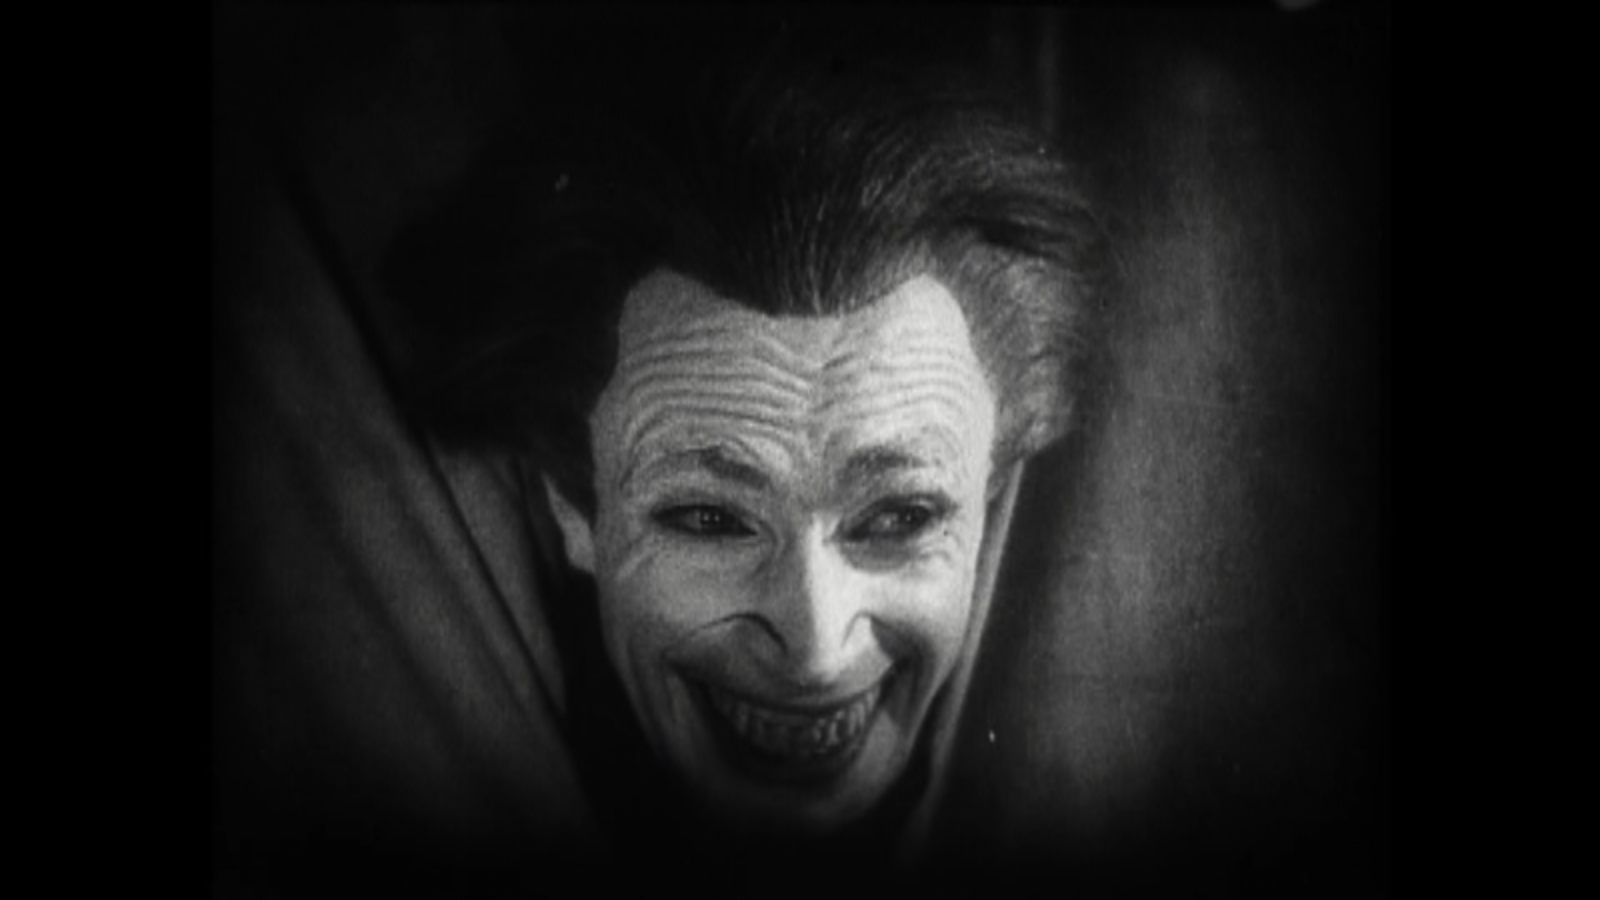 #54) The Man Who Laughs - (1928 - dir. Paul Leni)